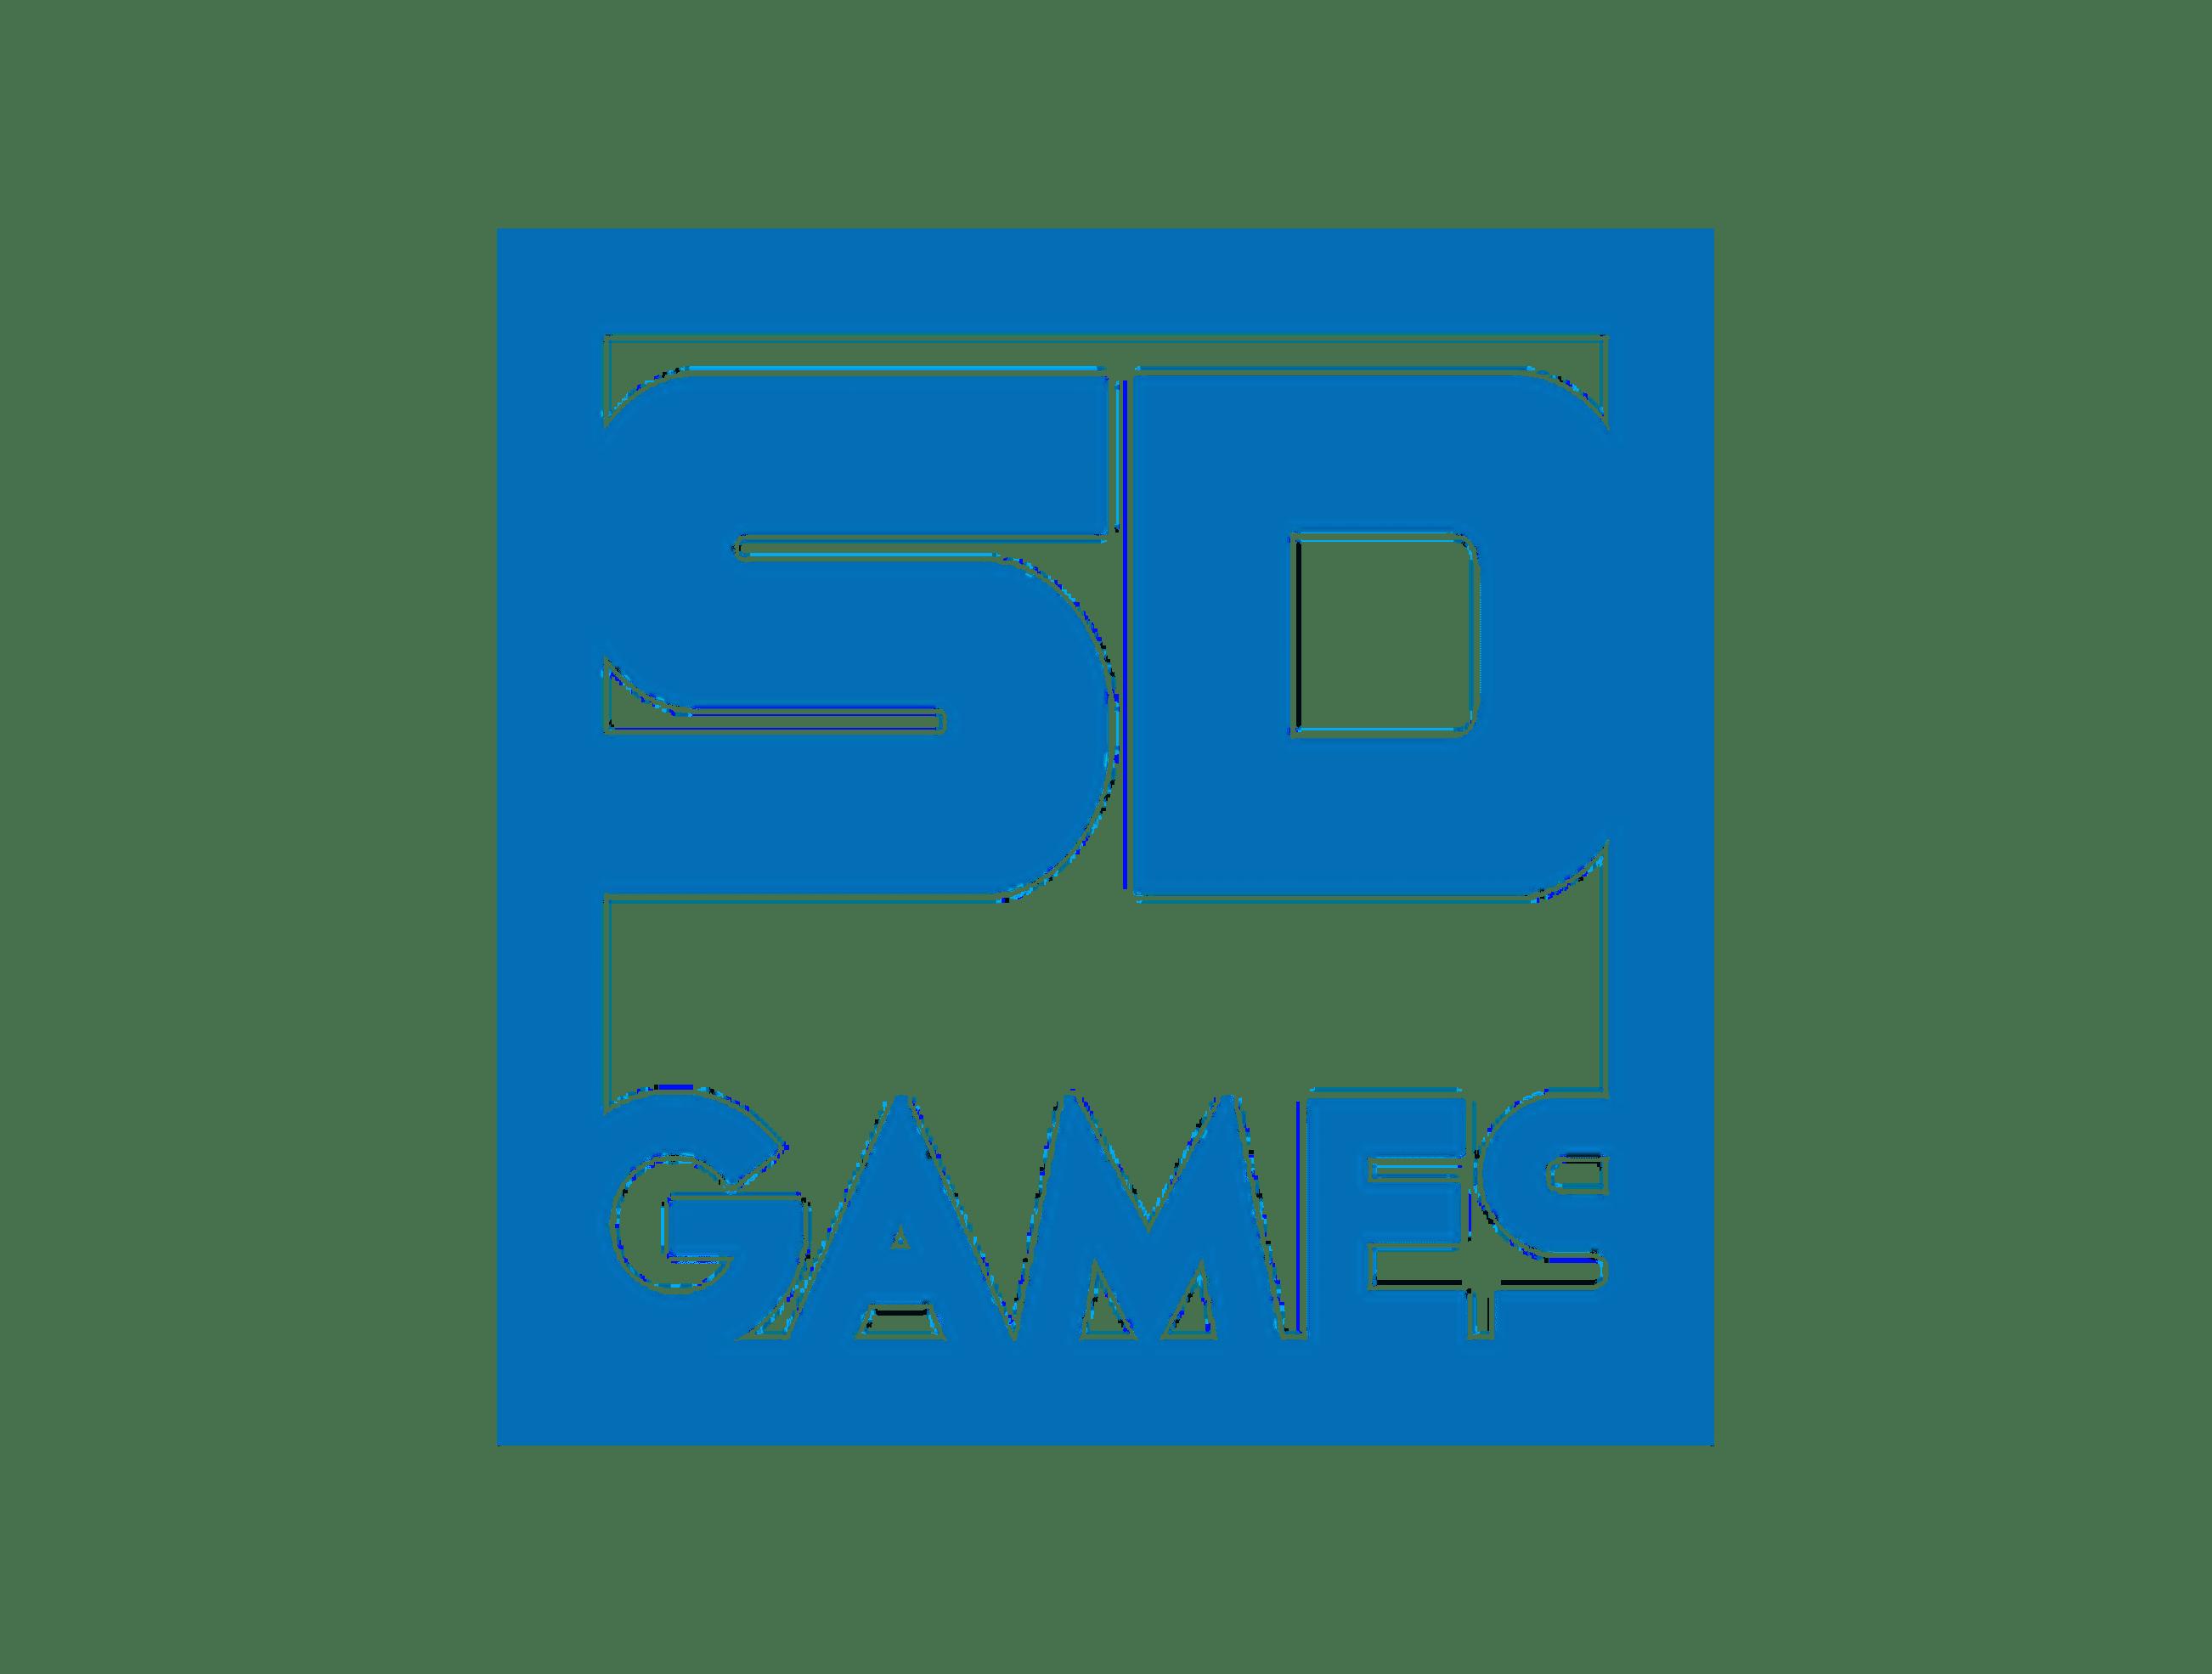 SdGaames_logo_meeplefoundry